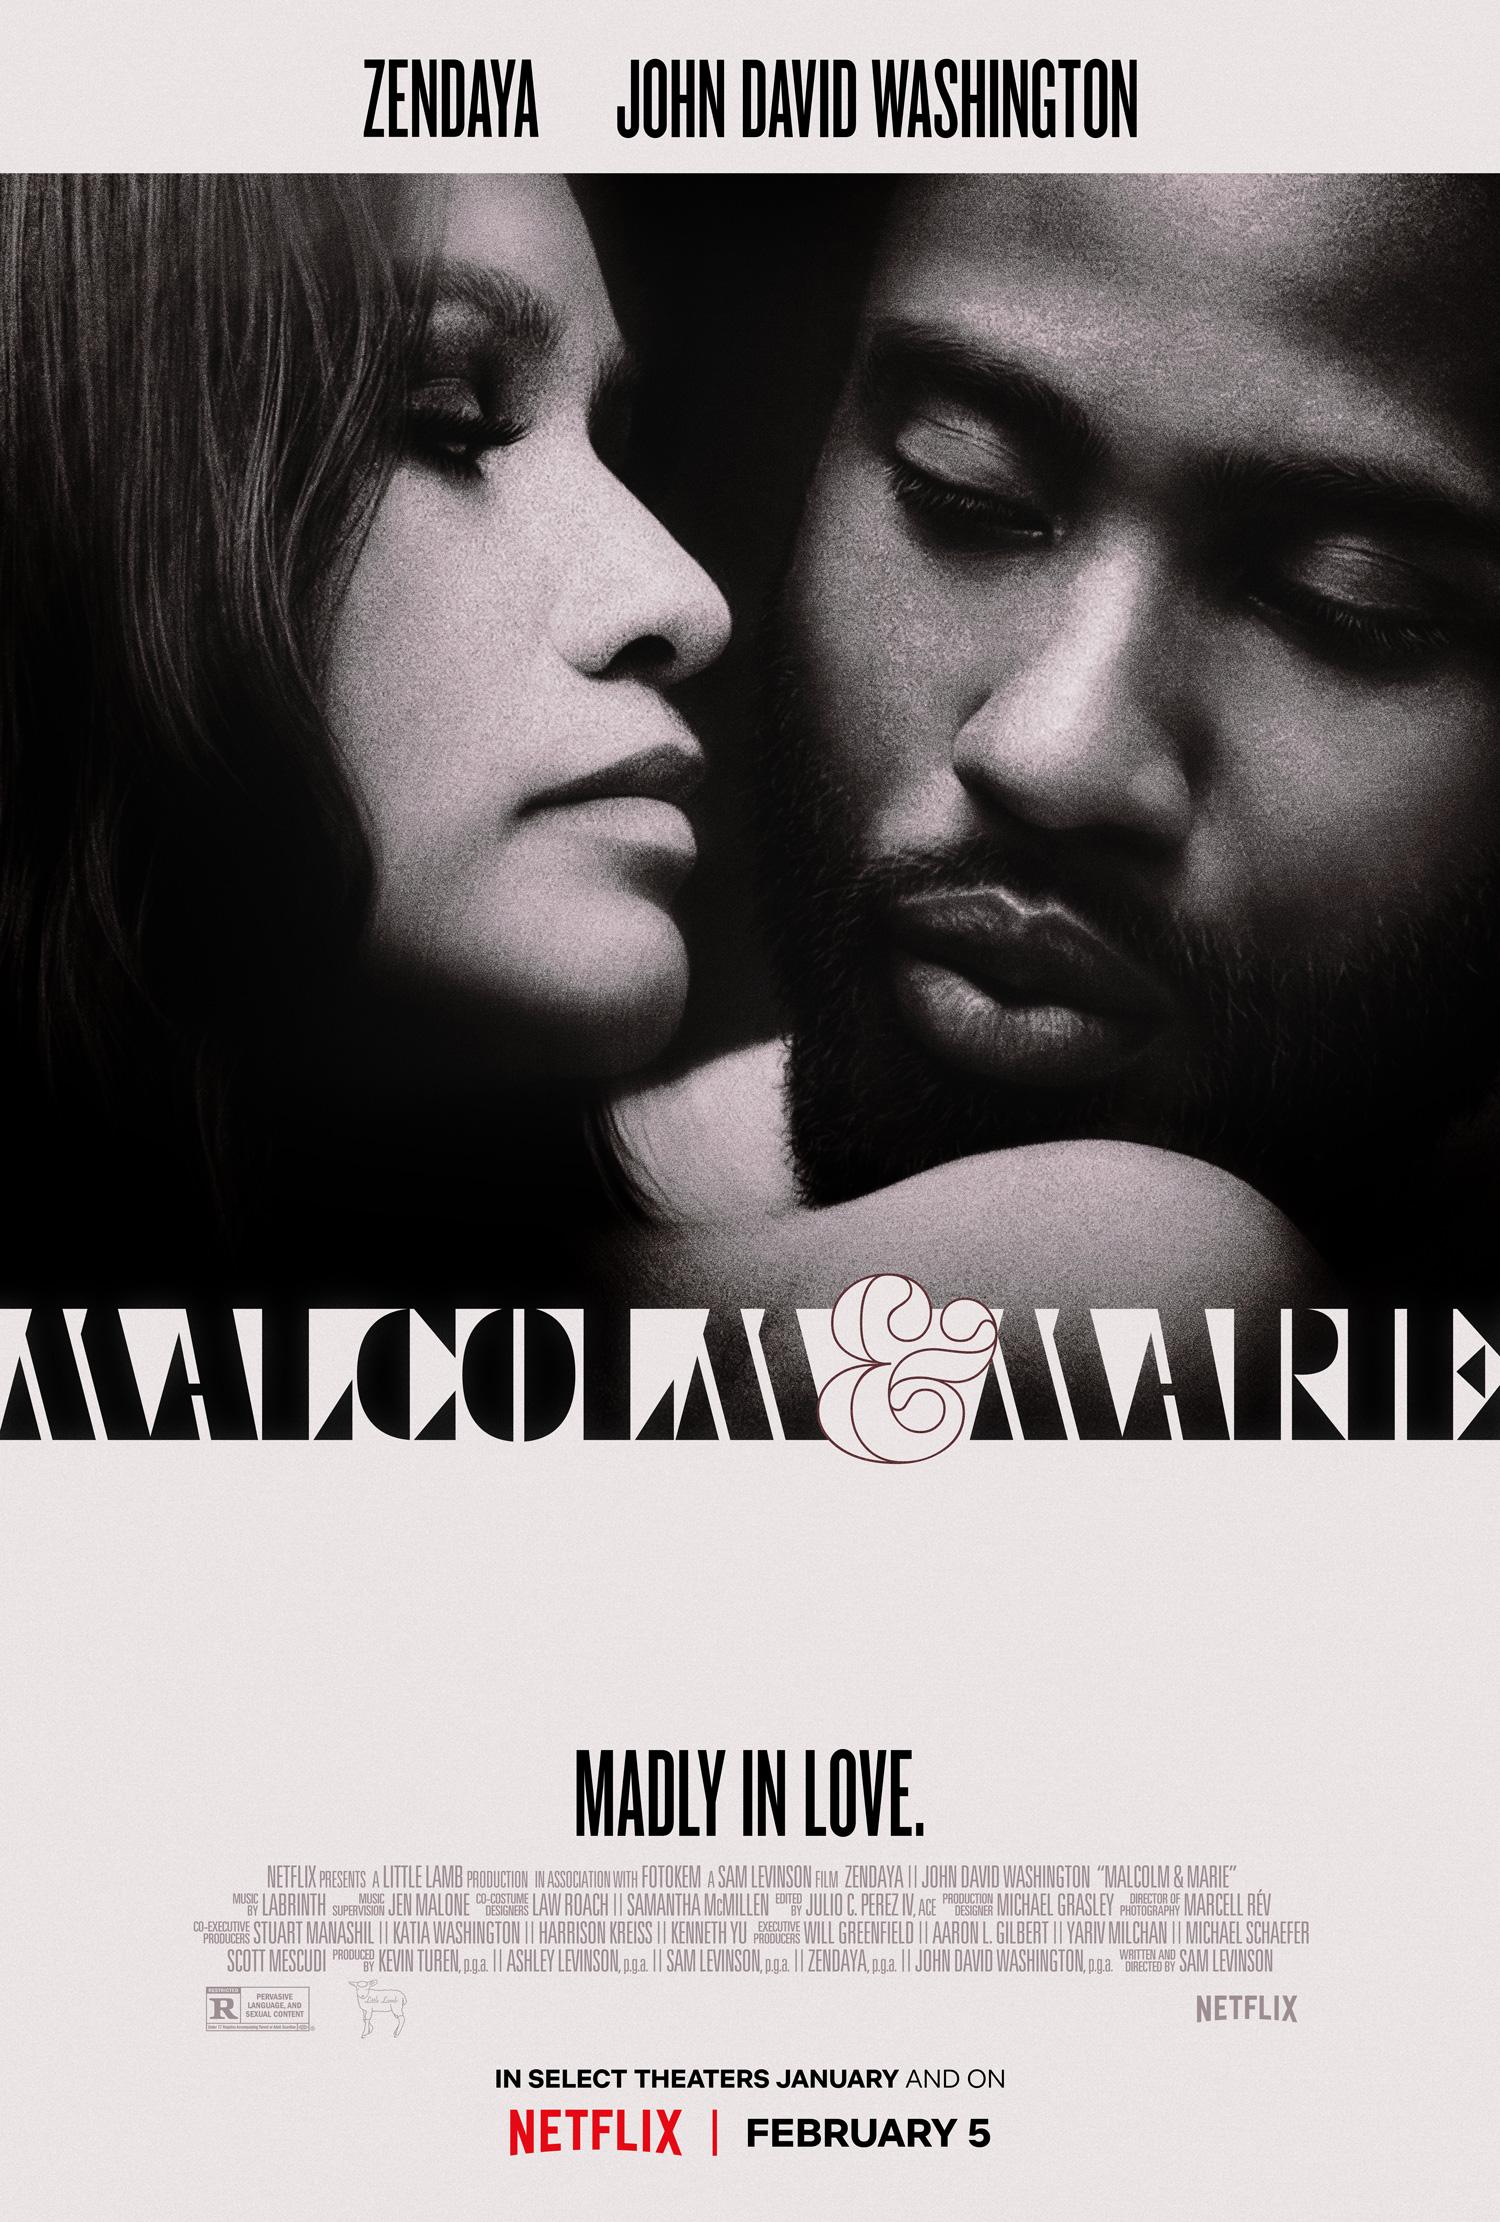 Malcolm & Marie 2021 English 720p HDRip ESubs 800MB | 350MB